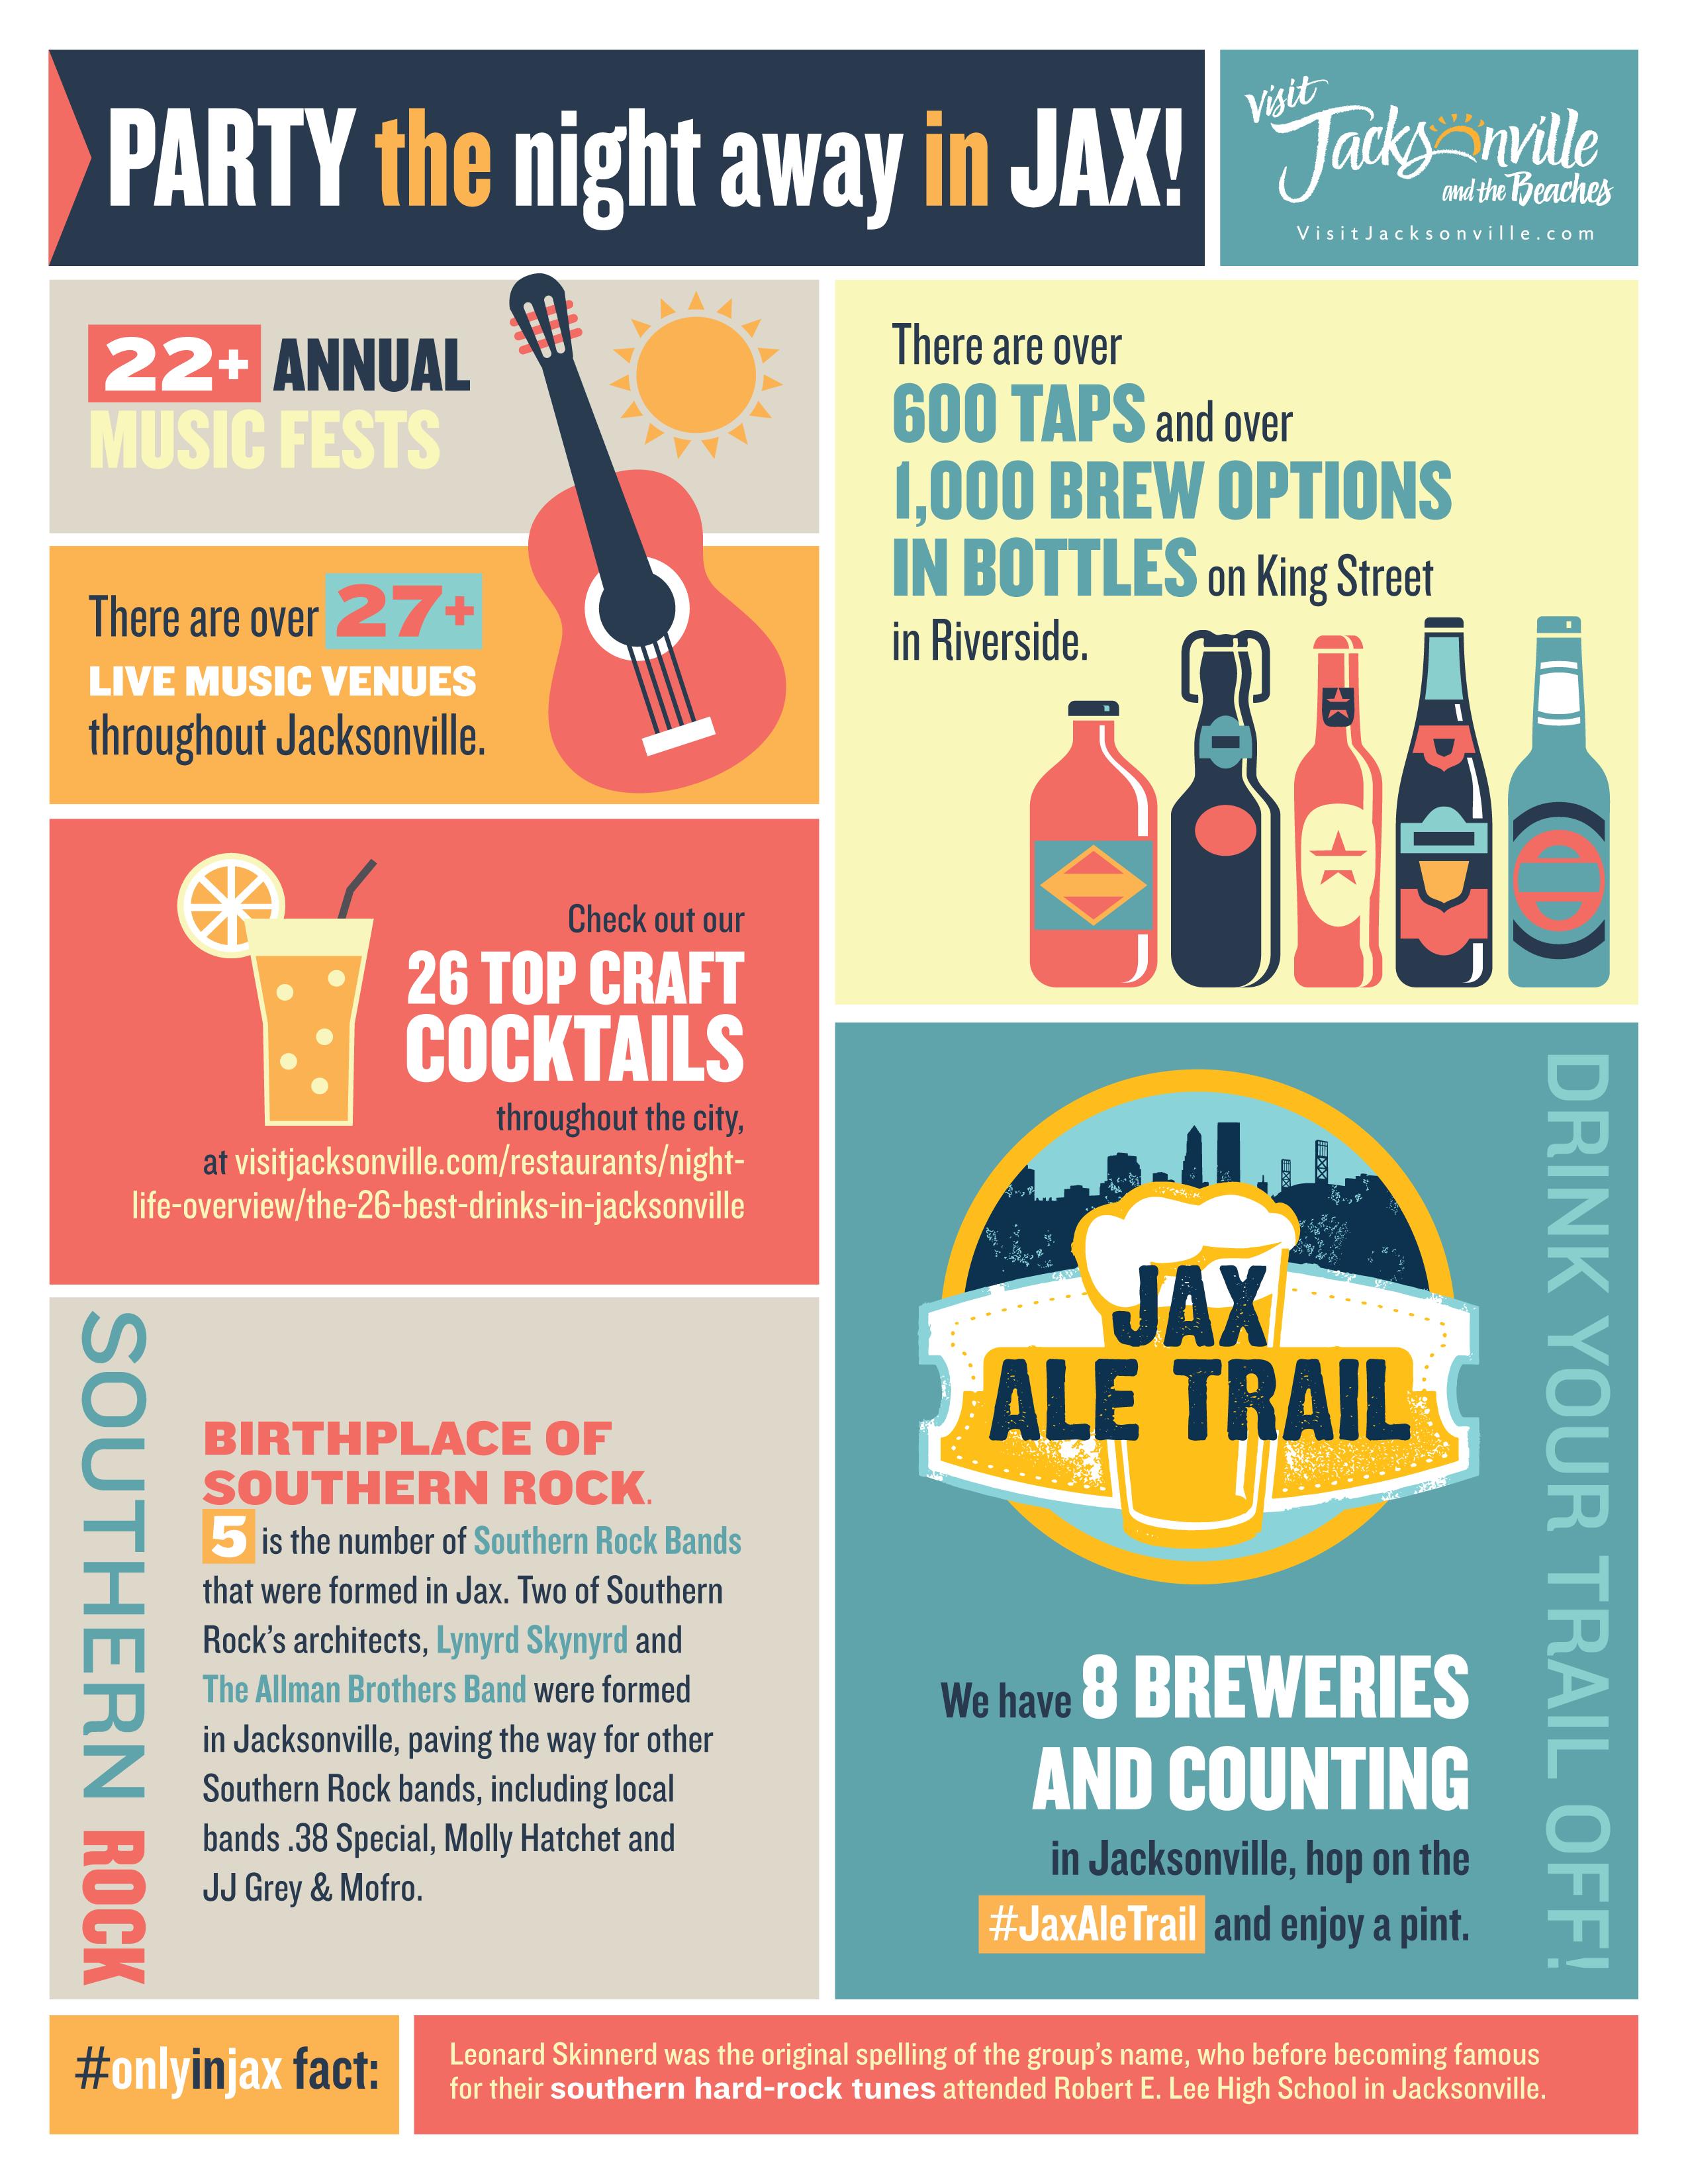 Jacksonville Nightlife Facts!